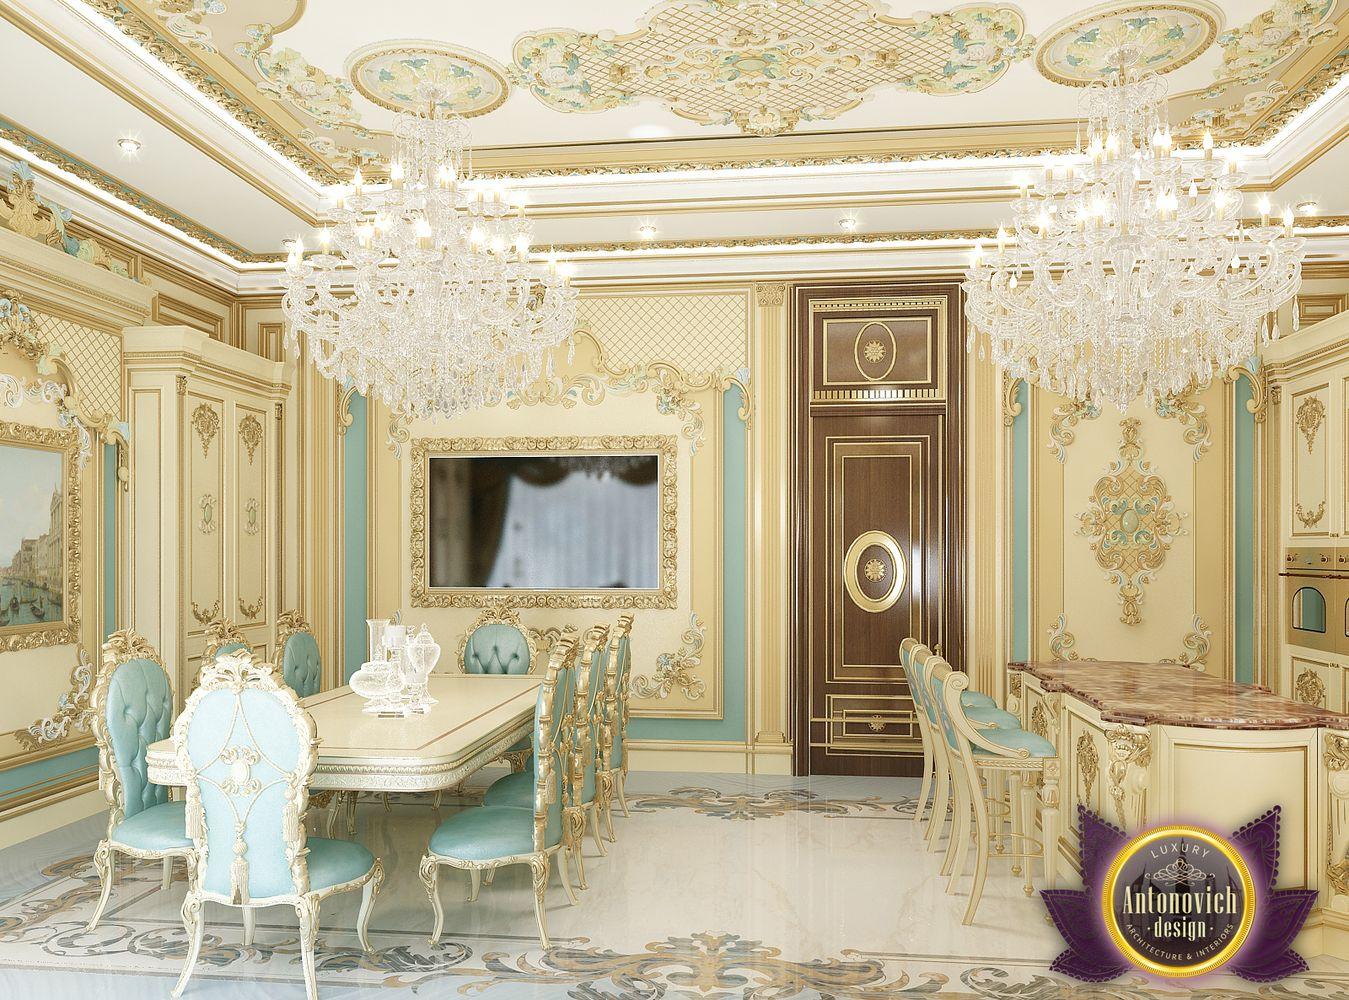 Kenyadesign: Kitchen interior design in classic style from Luxury Antonovich Design